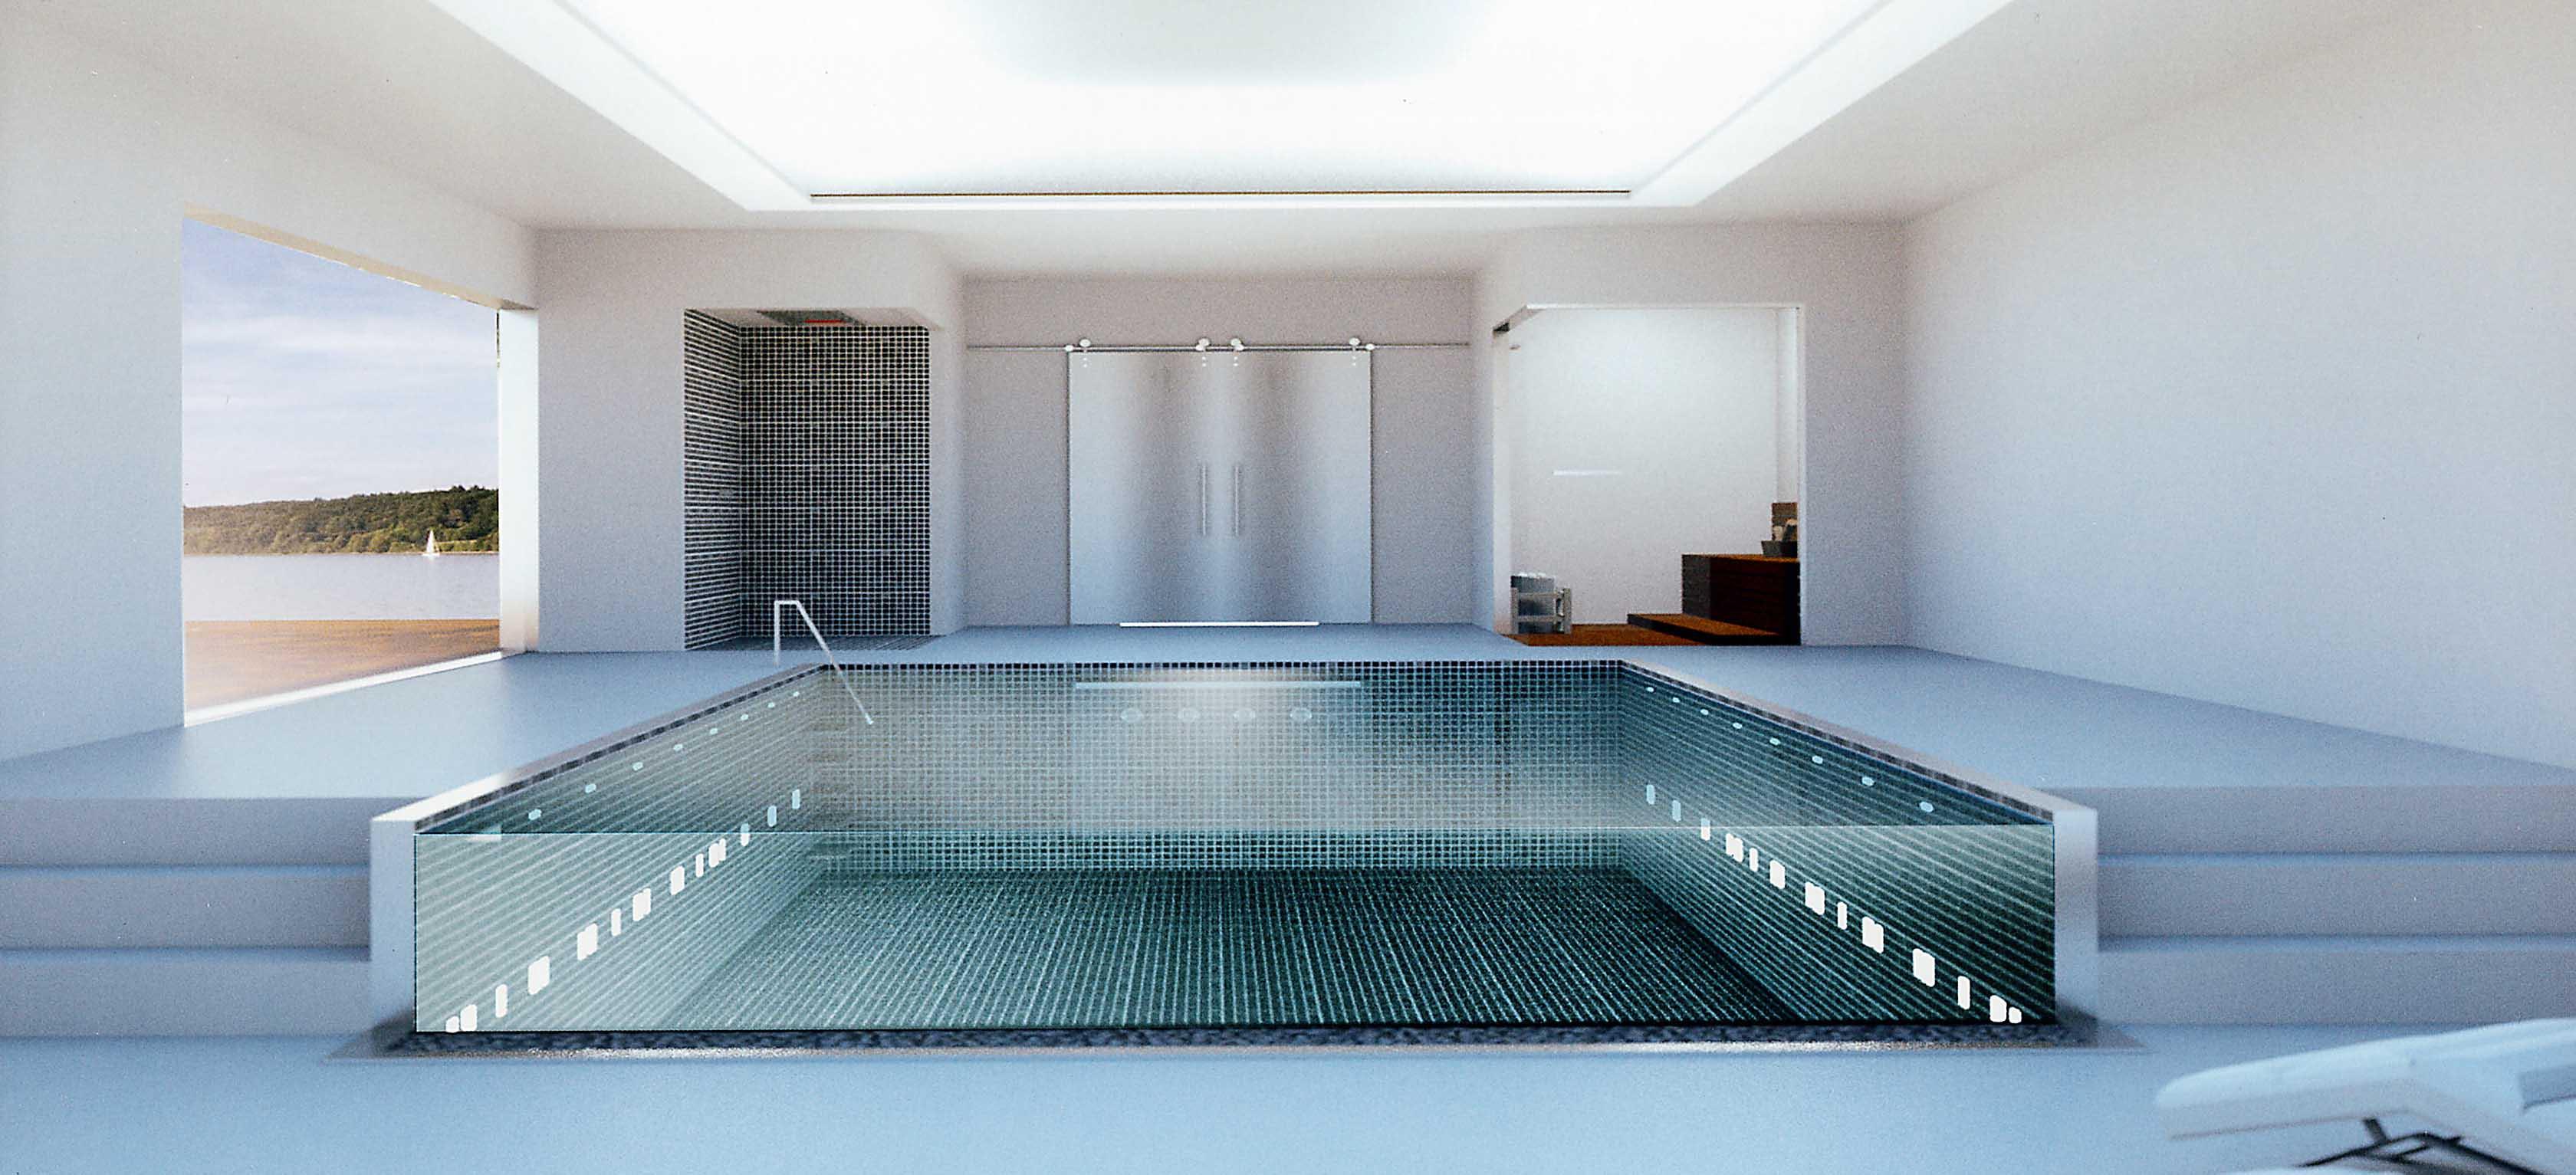 poolbau vom profi schwimmbadbau schwimmbadtechnik. Black Bedroom Furniture Sets. Home Design Ideas